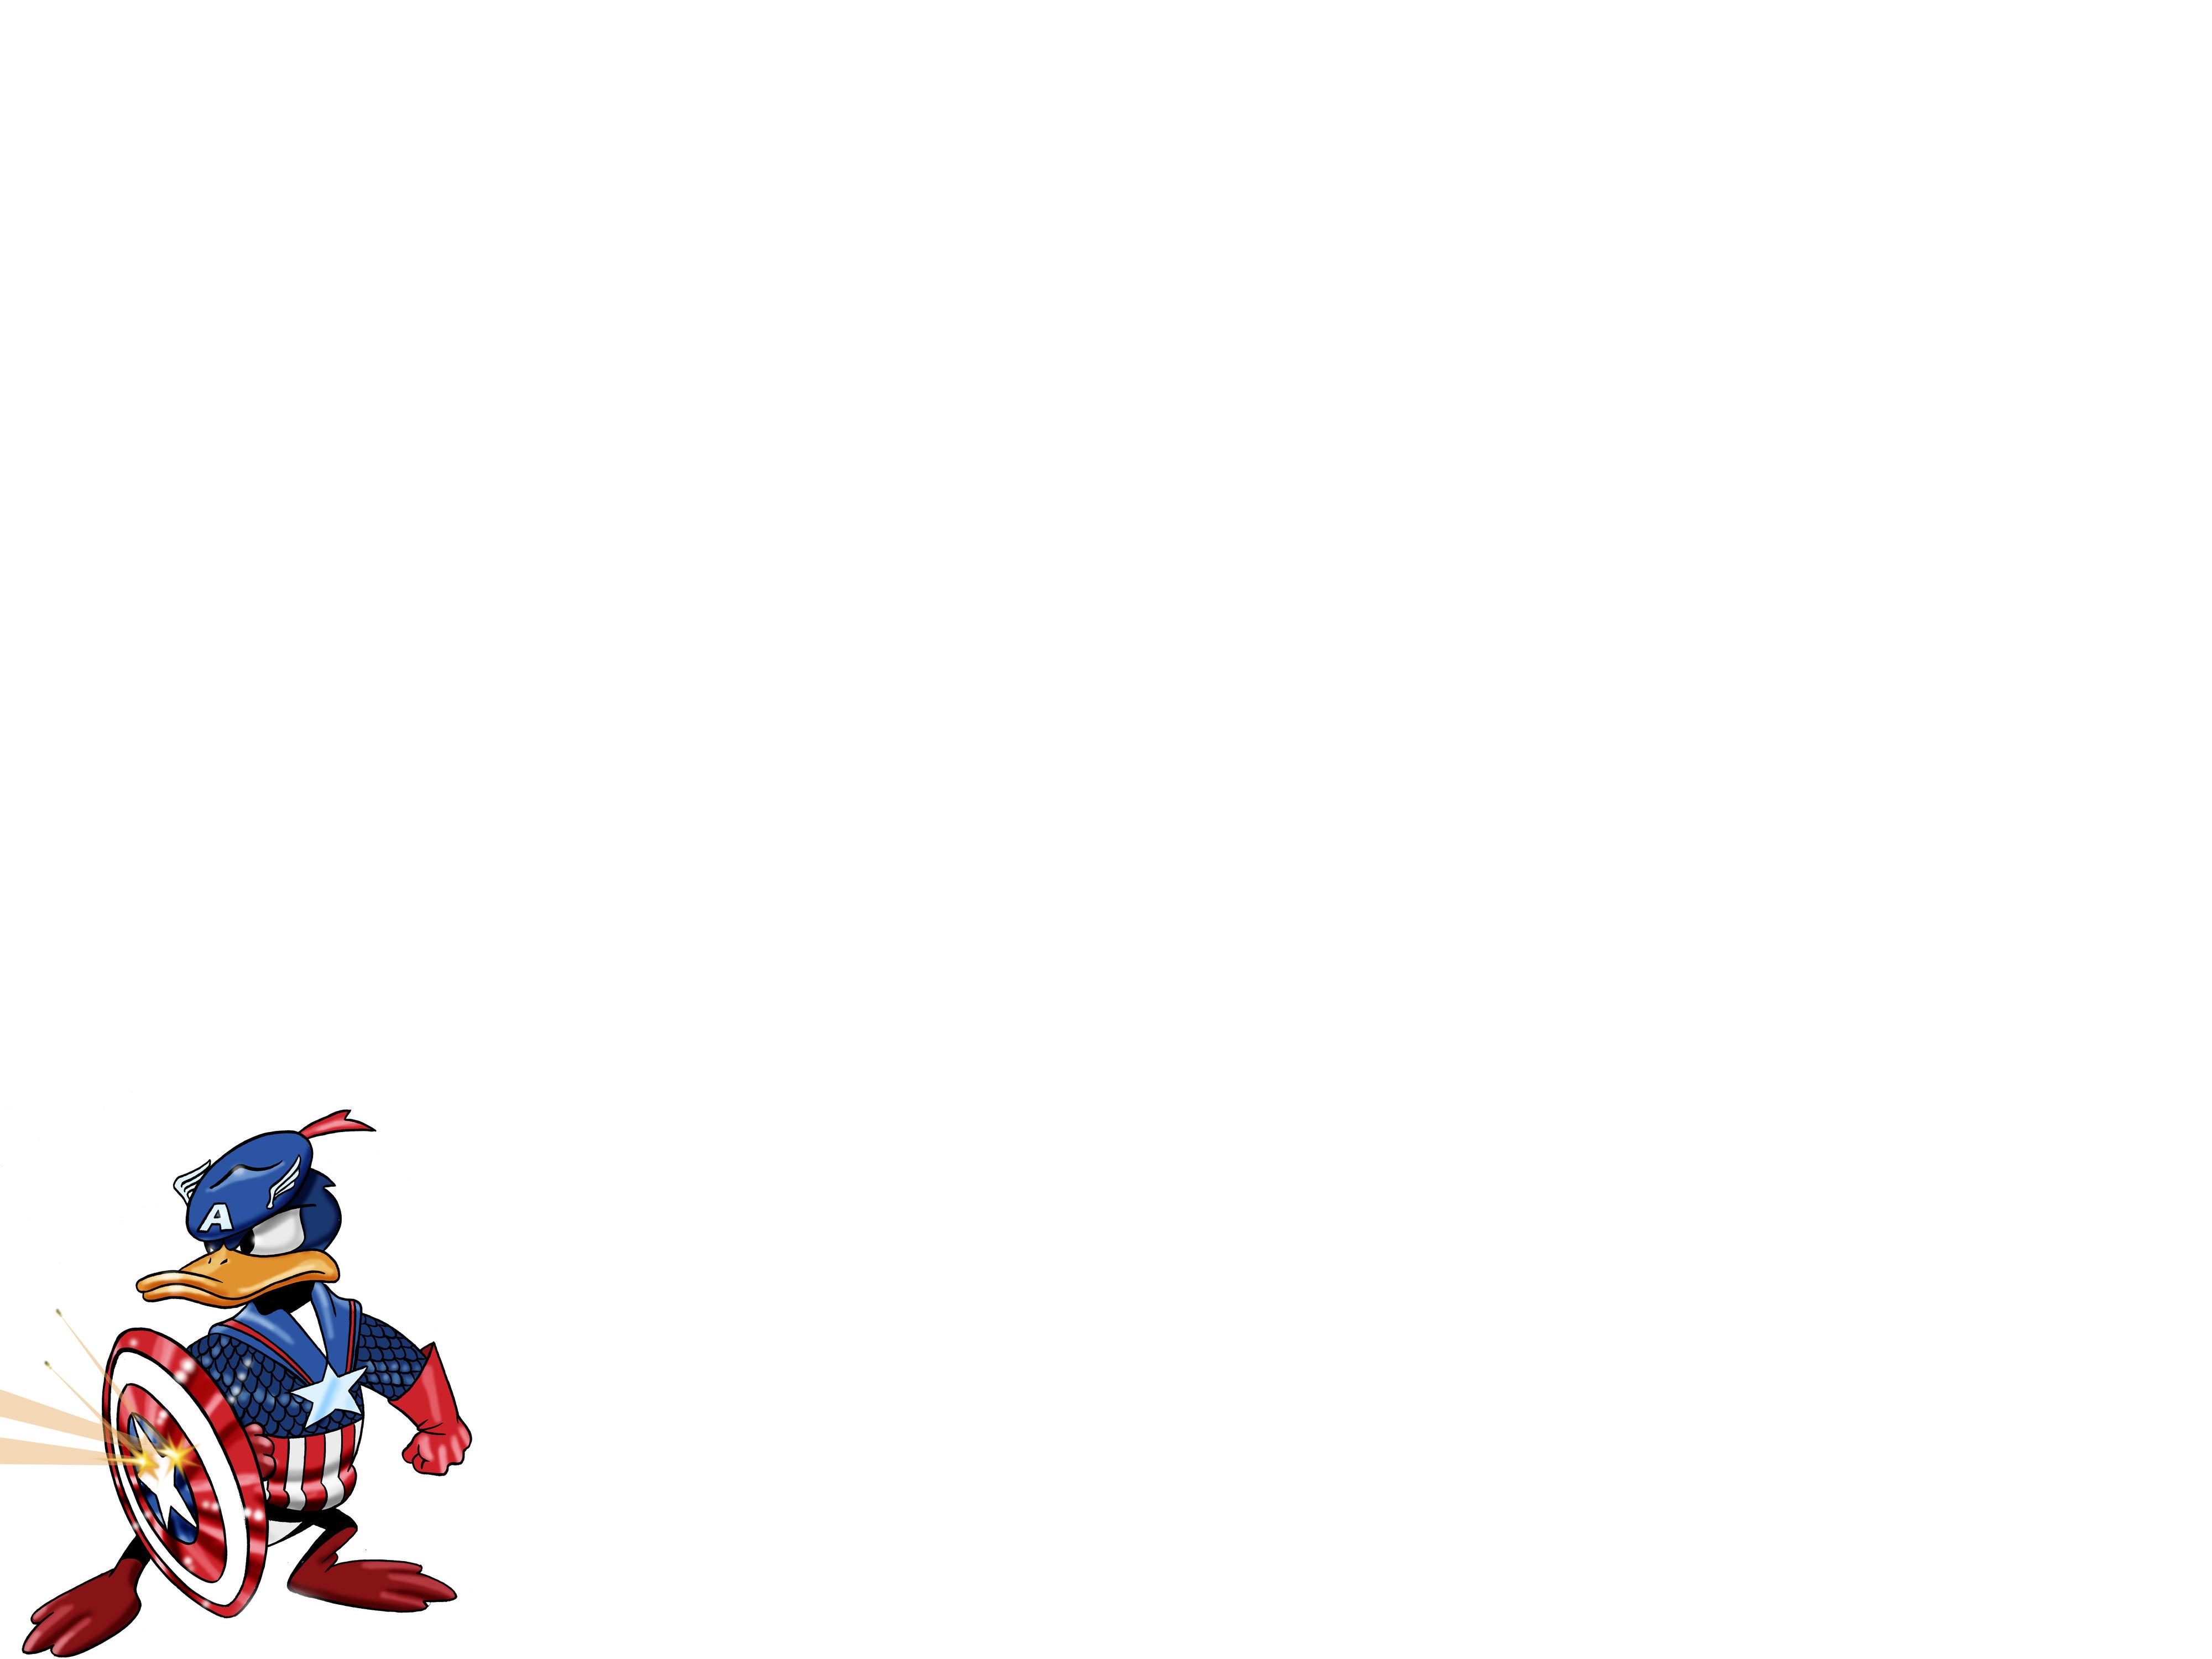 Wallpaper iphone donald duck - Comics Captain America Donald Duck Wallpaper